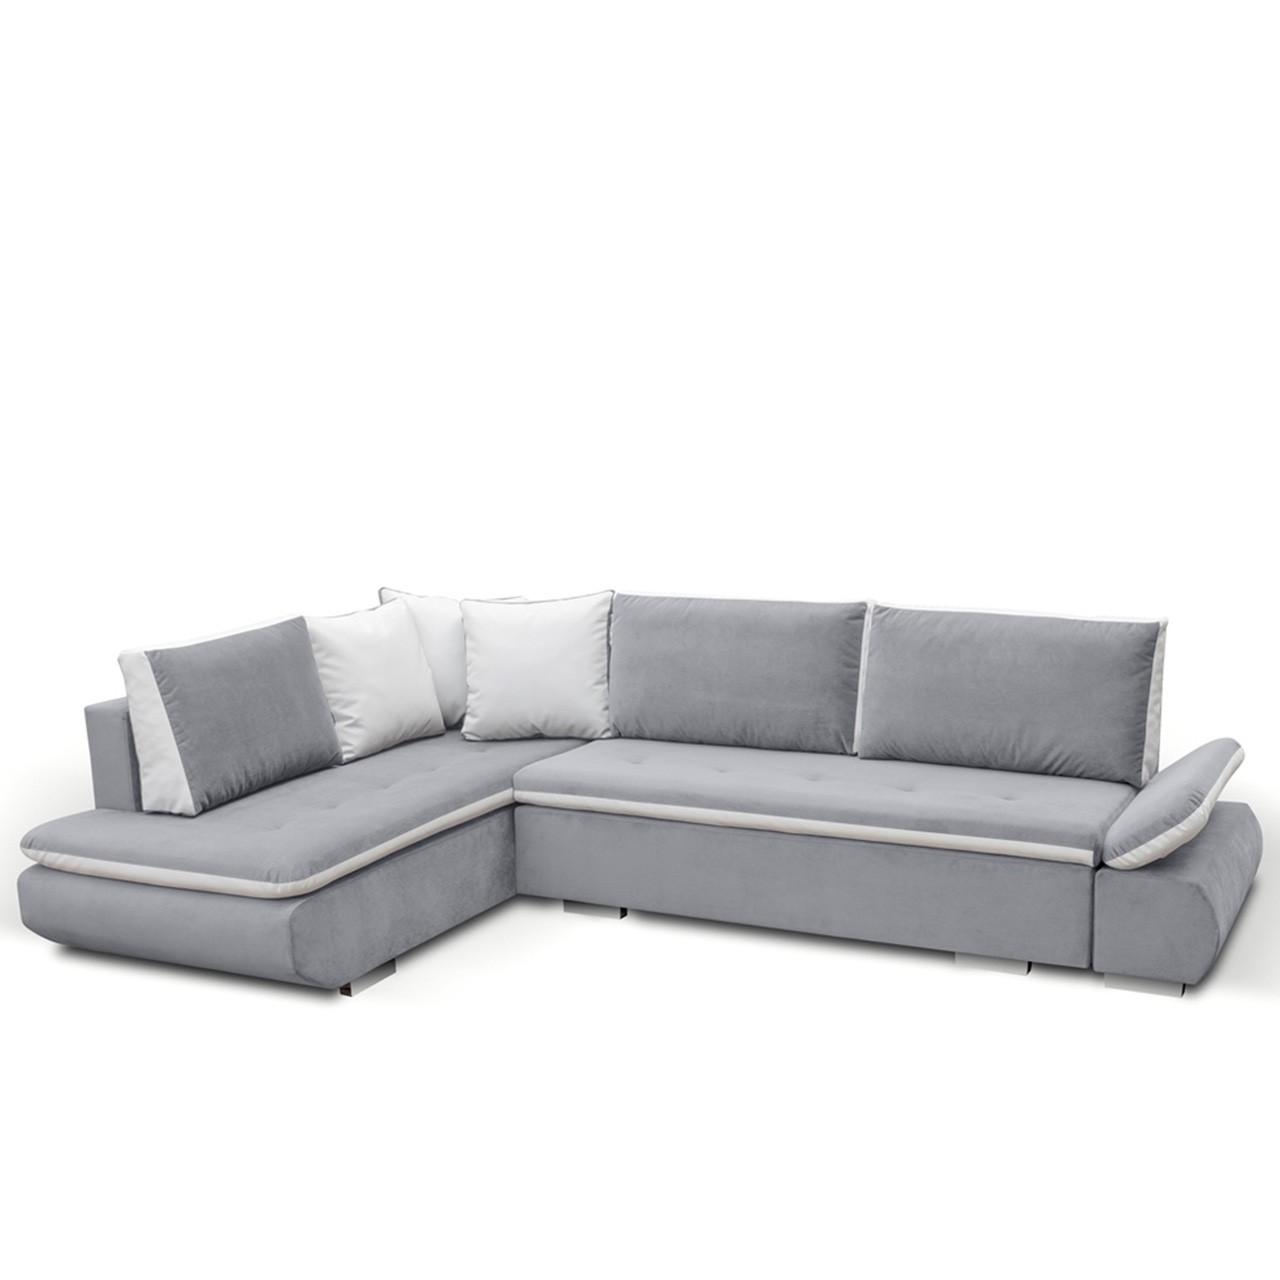 ikea sofa mit schlaffunktion sofa mit schlaffunktion ikea. Black Bedroom Furniture Sets. Home Design Ideas